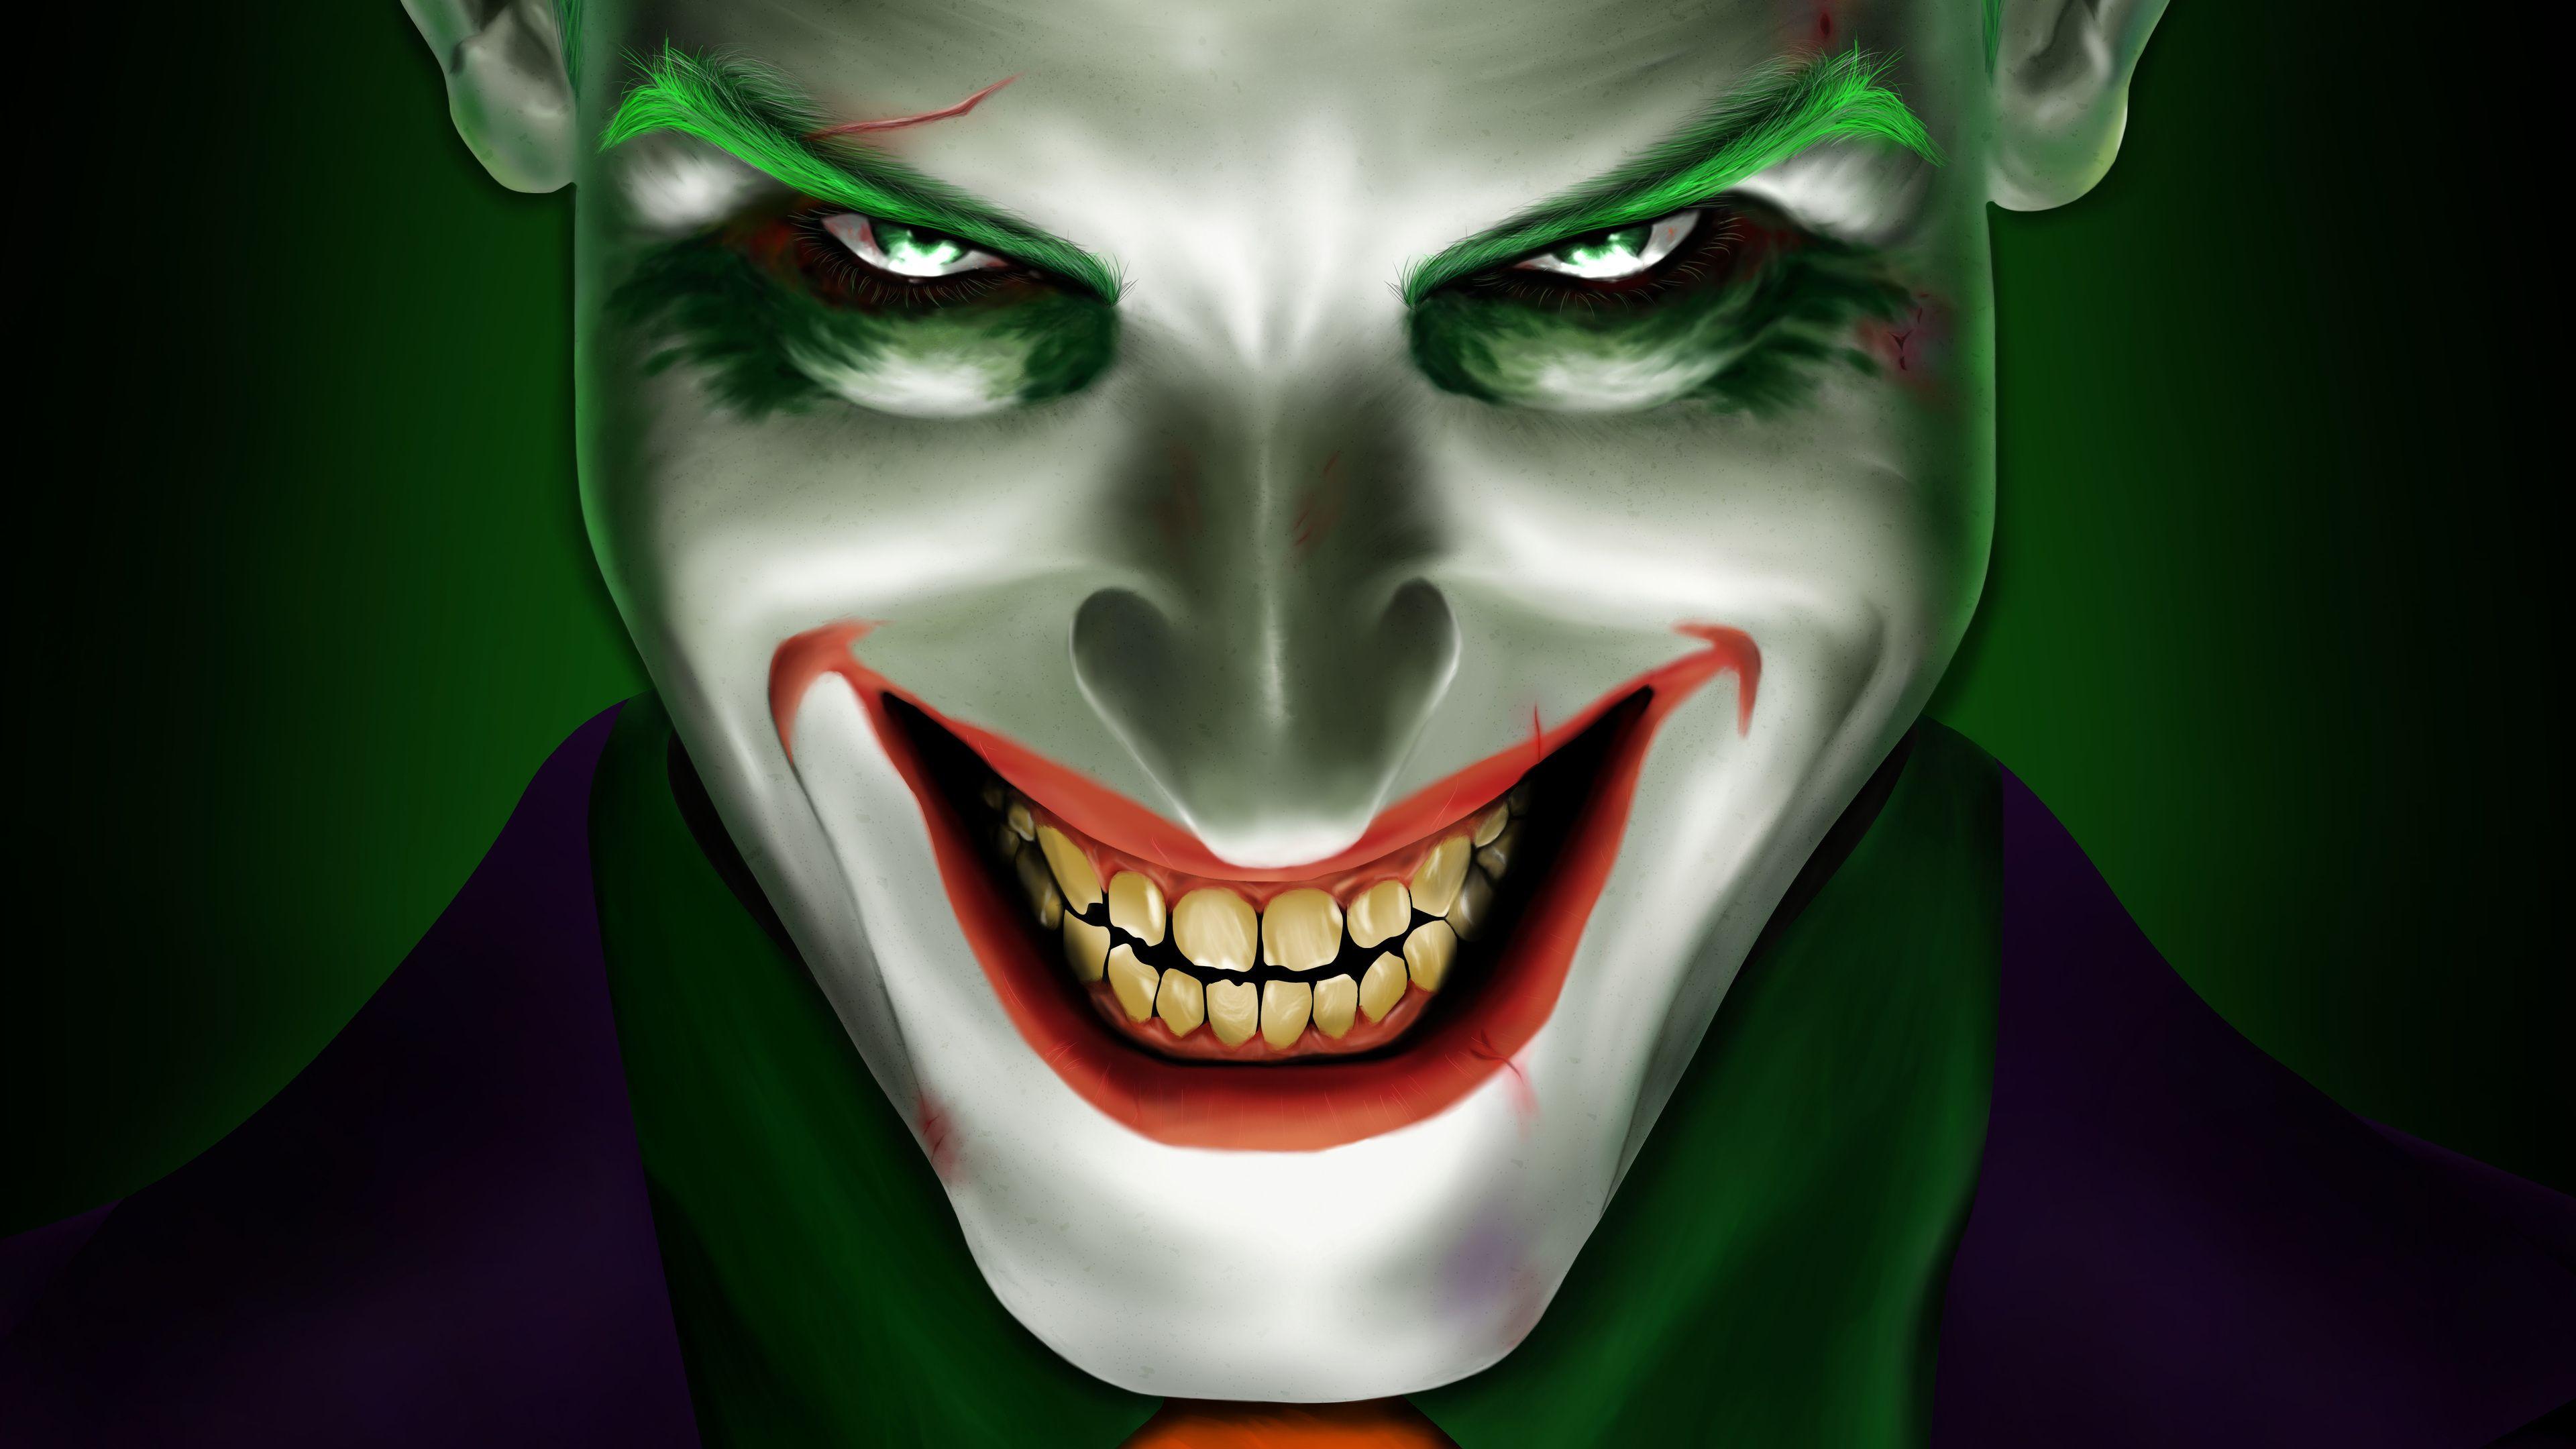 Joker Wallpapers 4k Hd Joker Backgrounds On Wallpaperbat